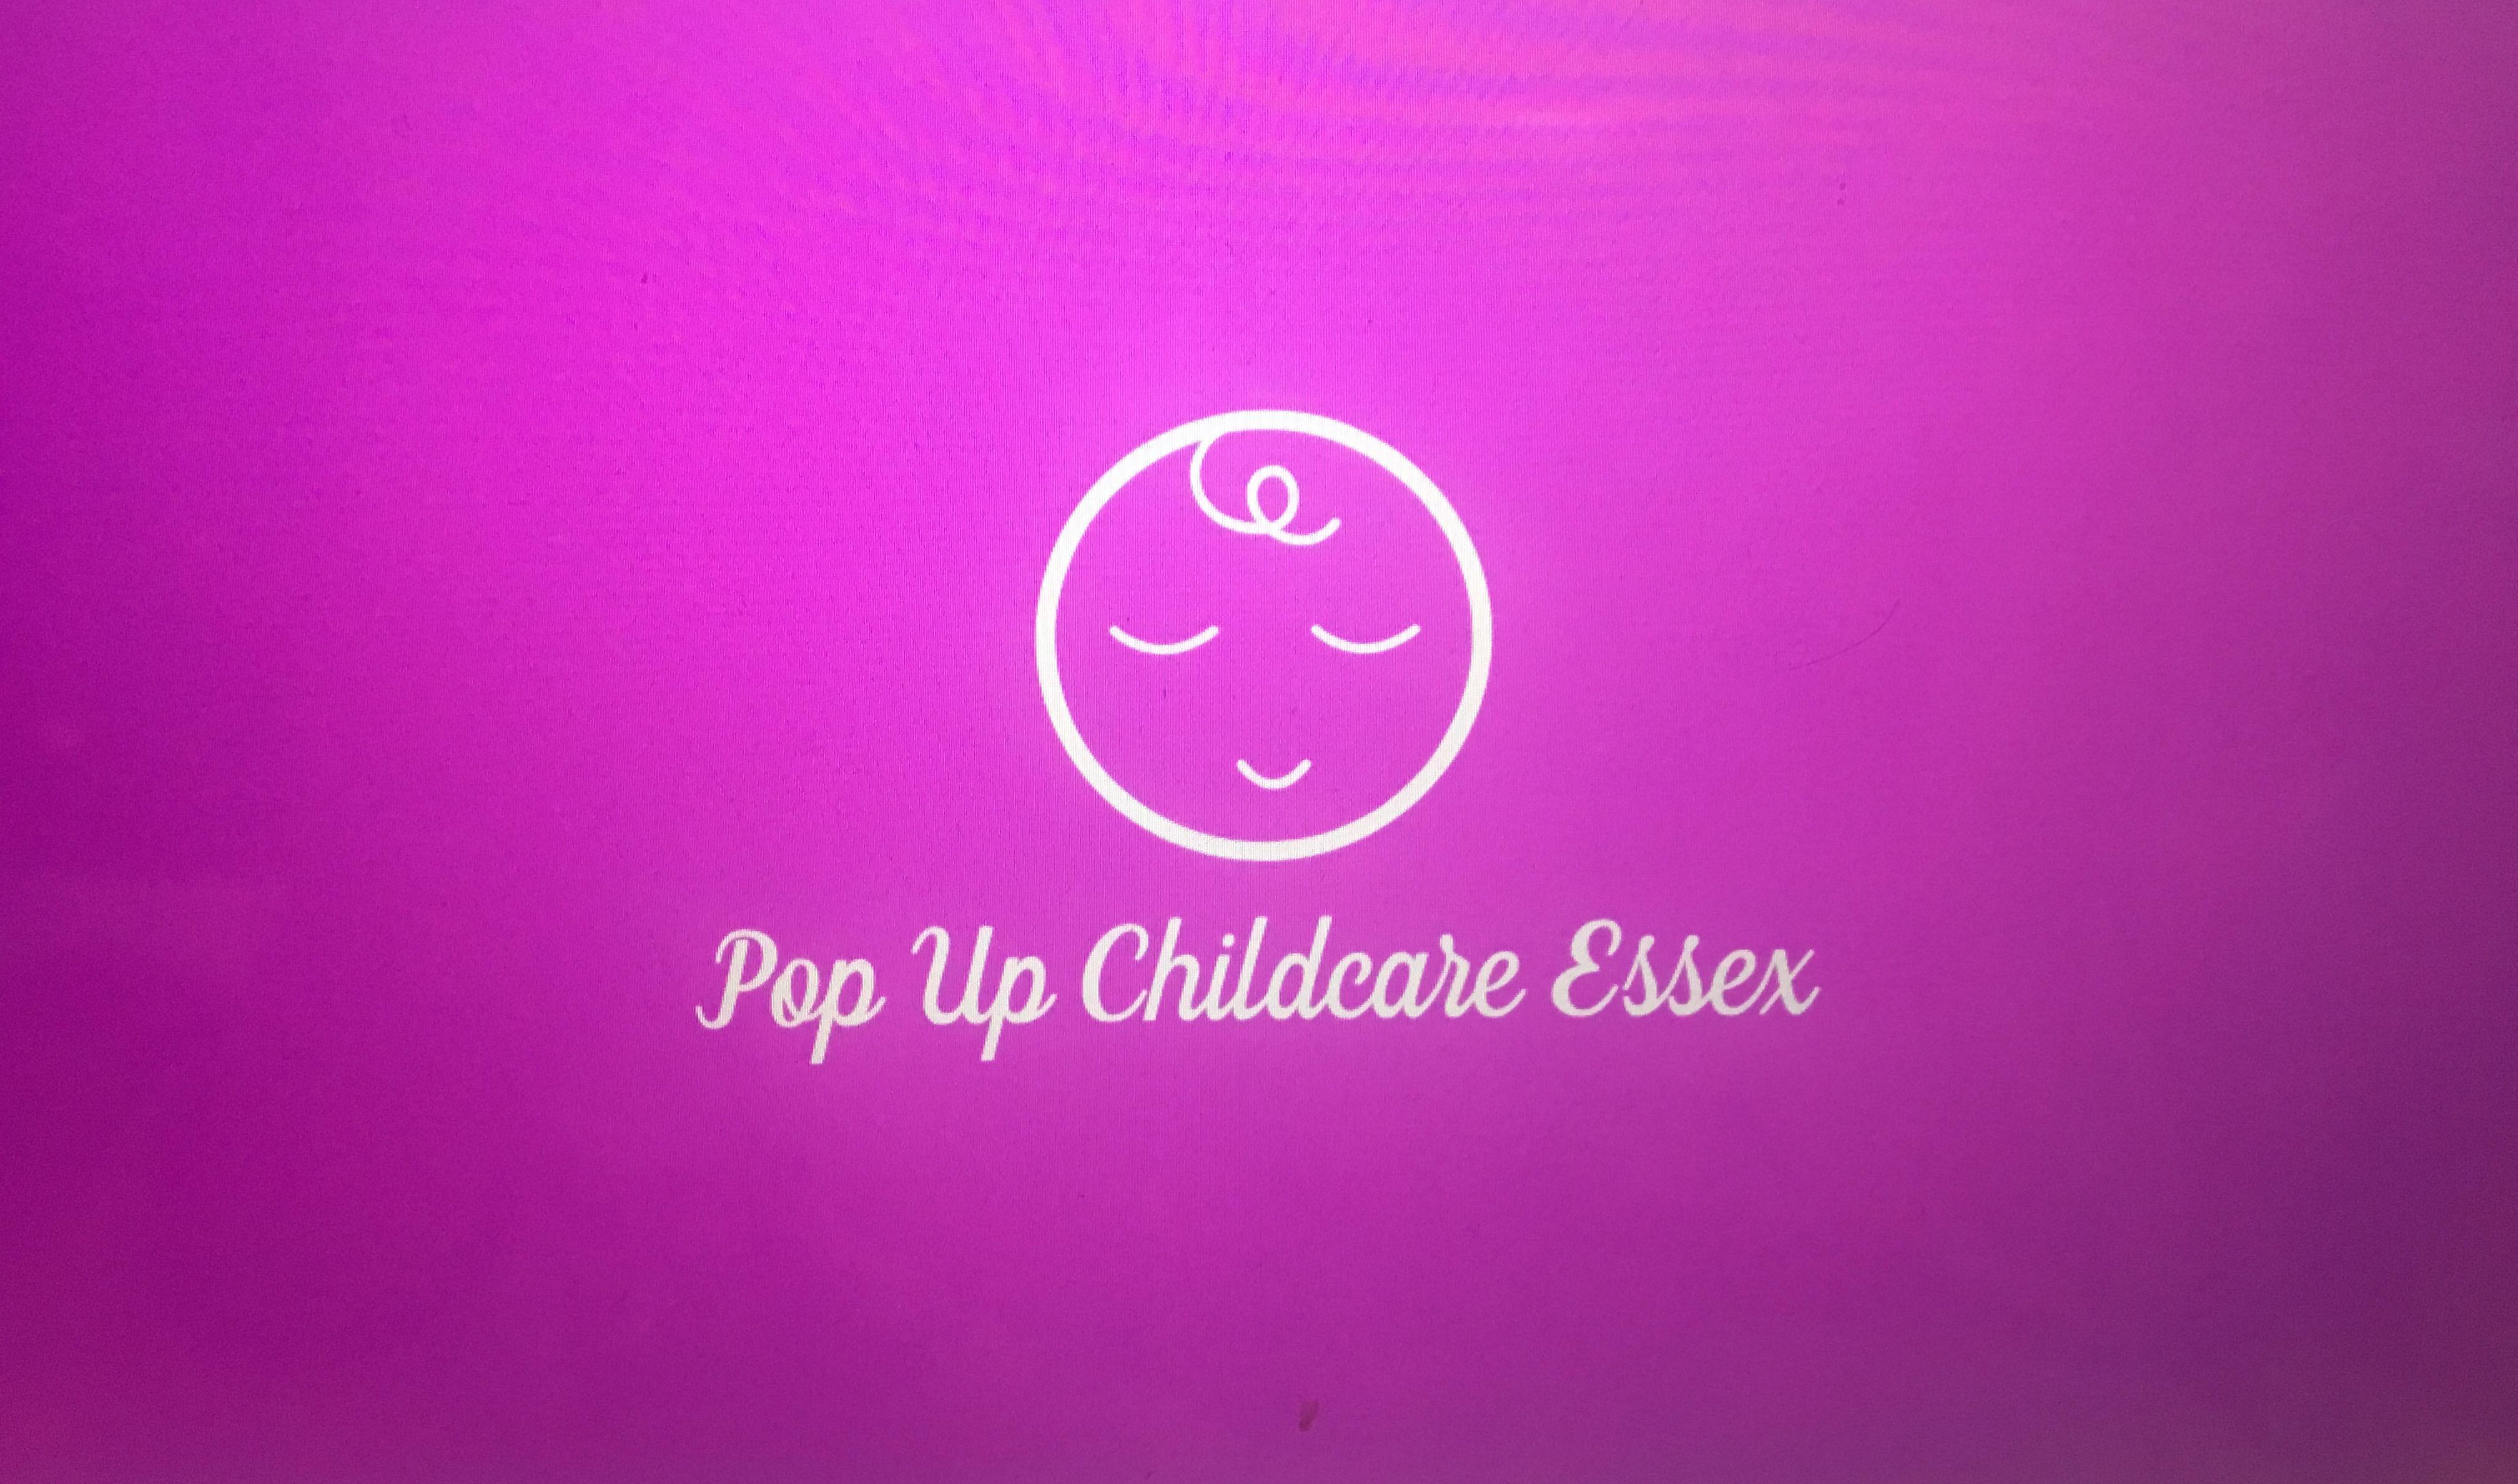 Pop Up Childcare Essex